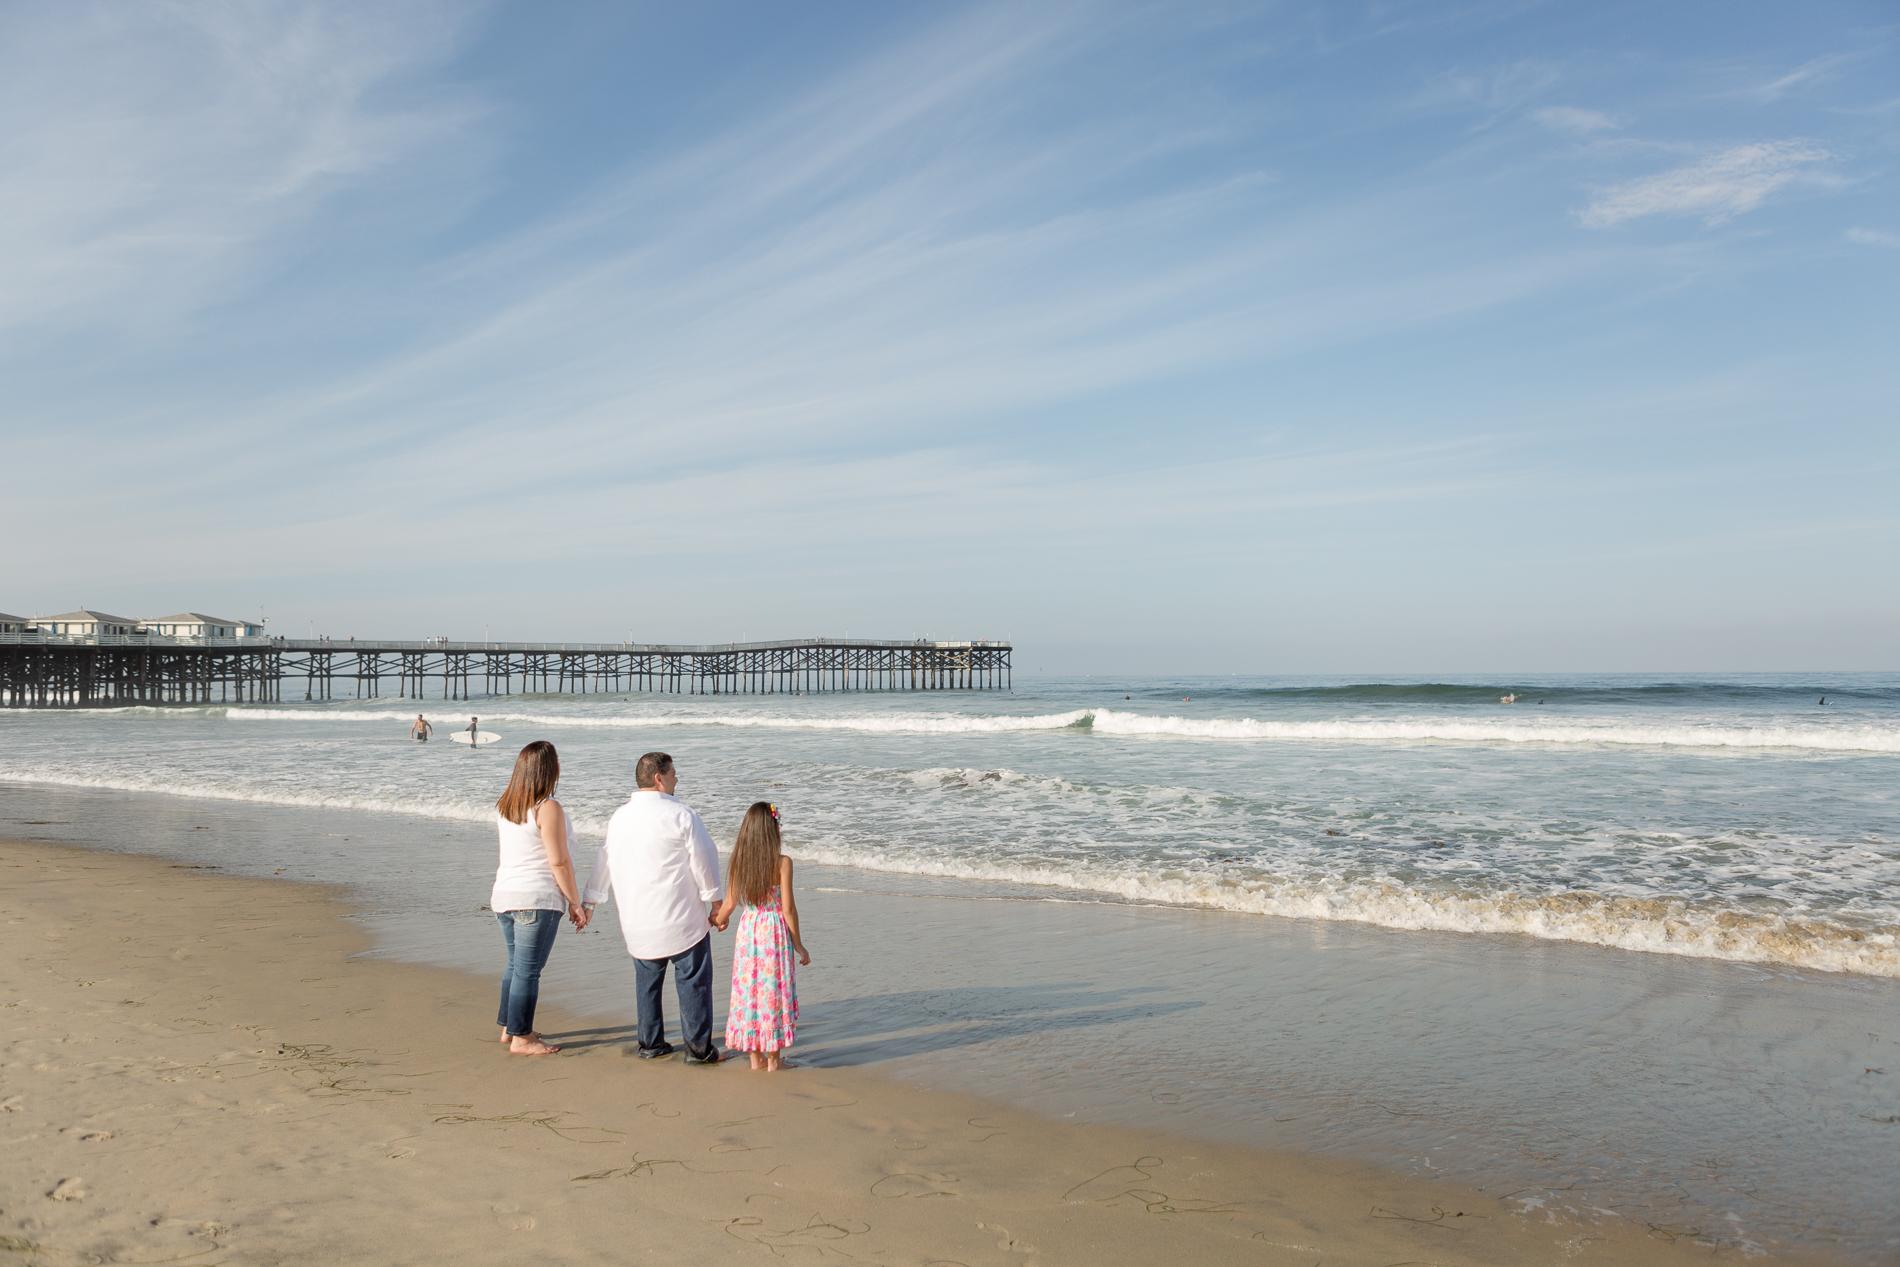 San.Diego.Family.Vacation.Photographer.Christine.Dammann.Photography.GFWS-6.jpg